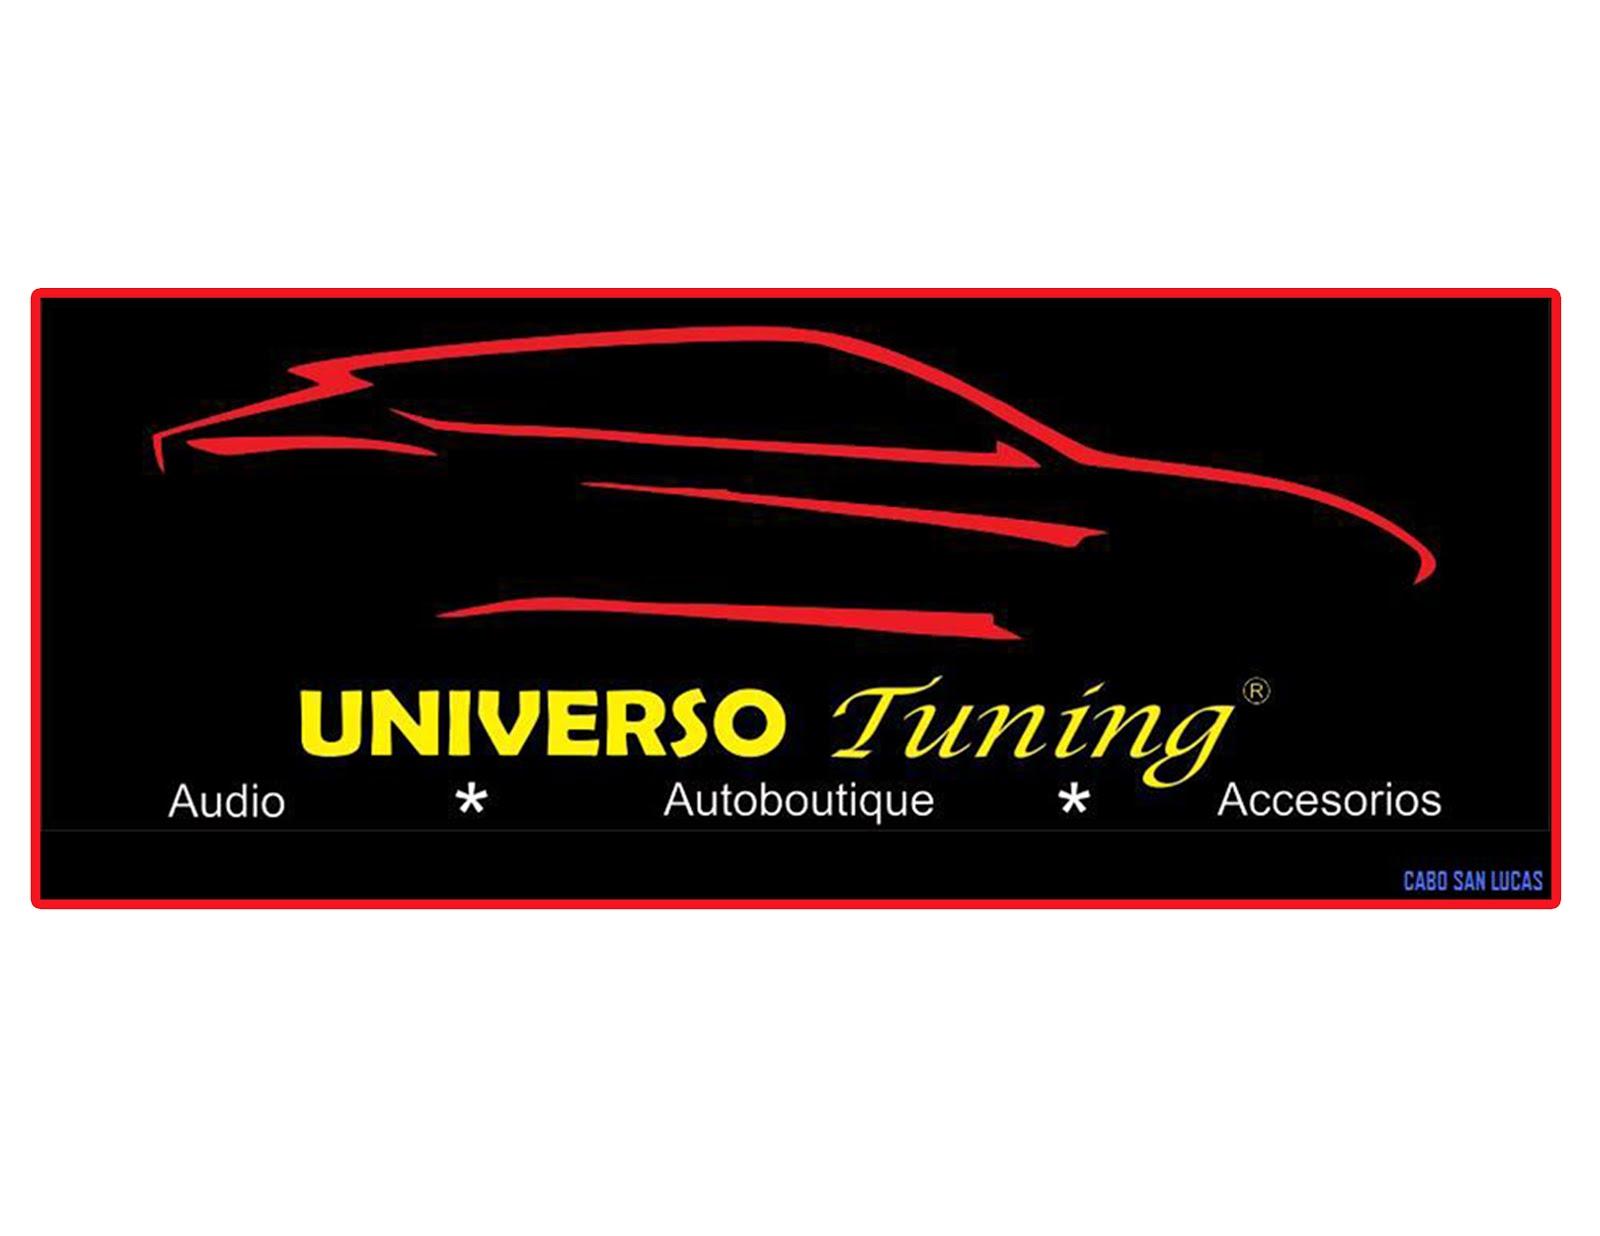 UNIVERSO TUNING